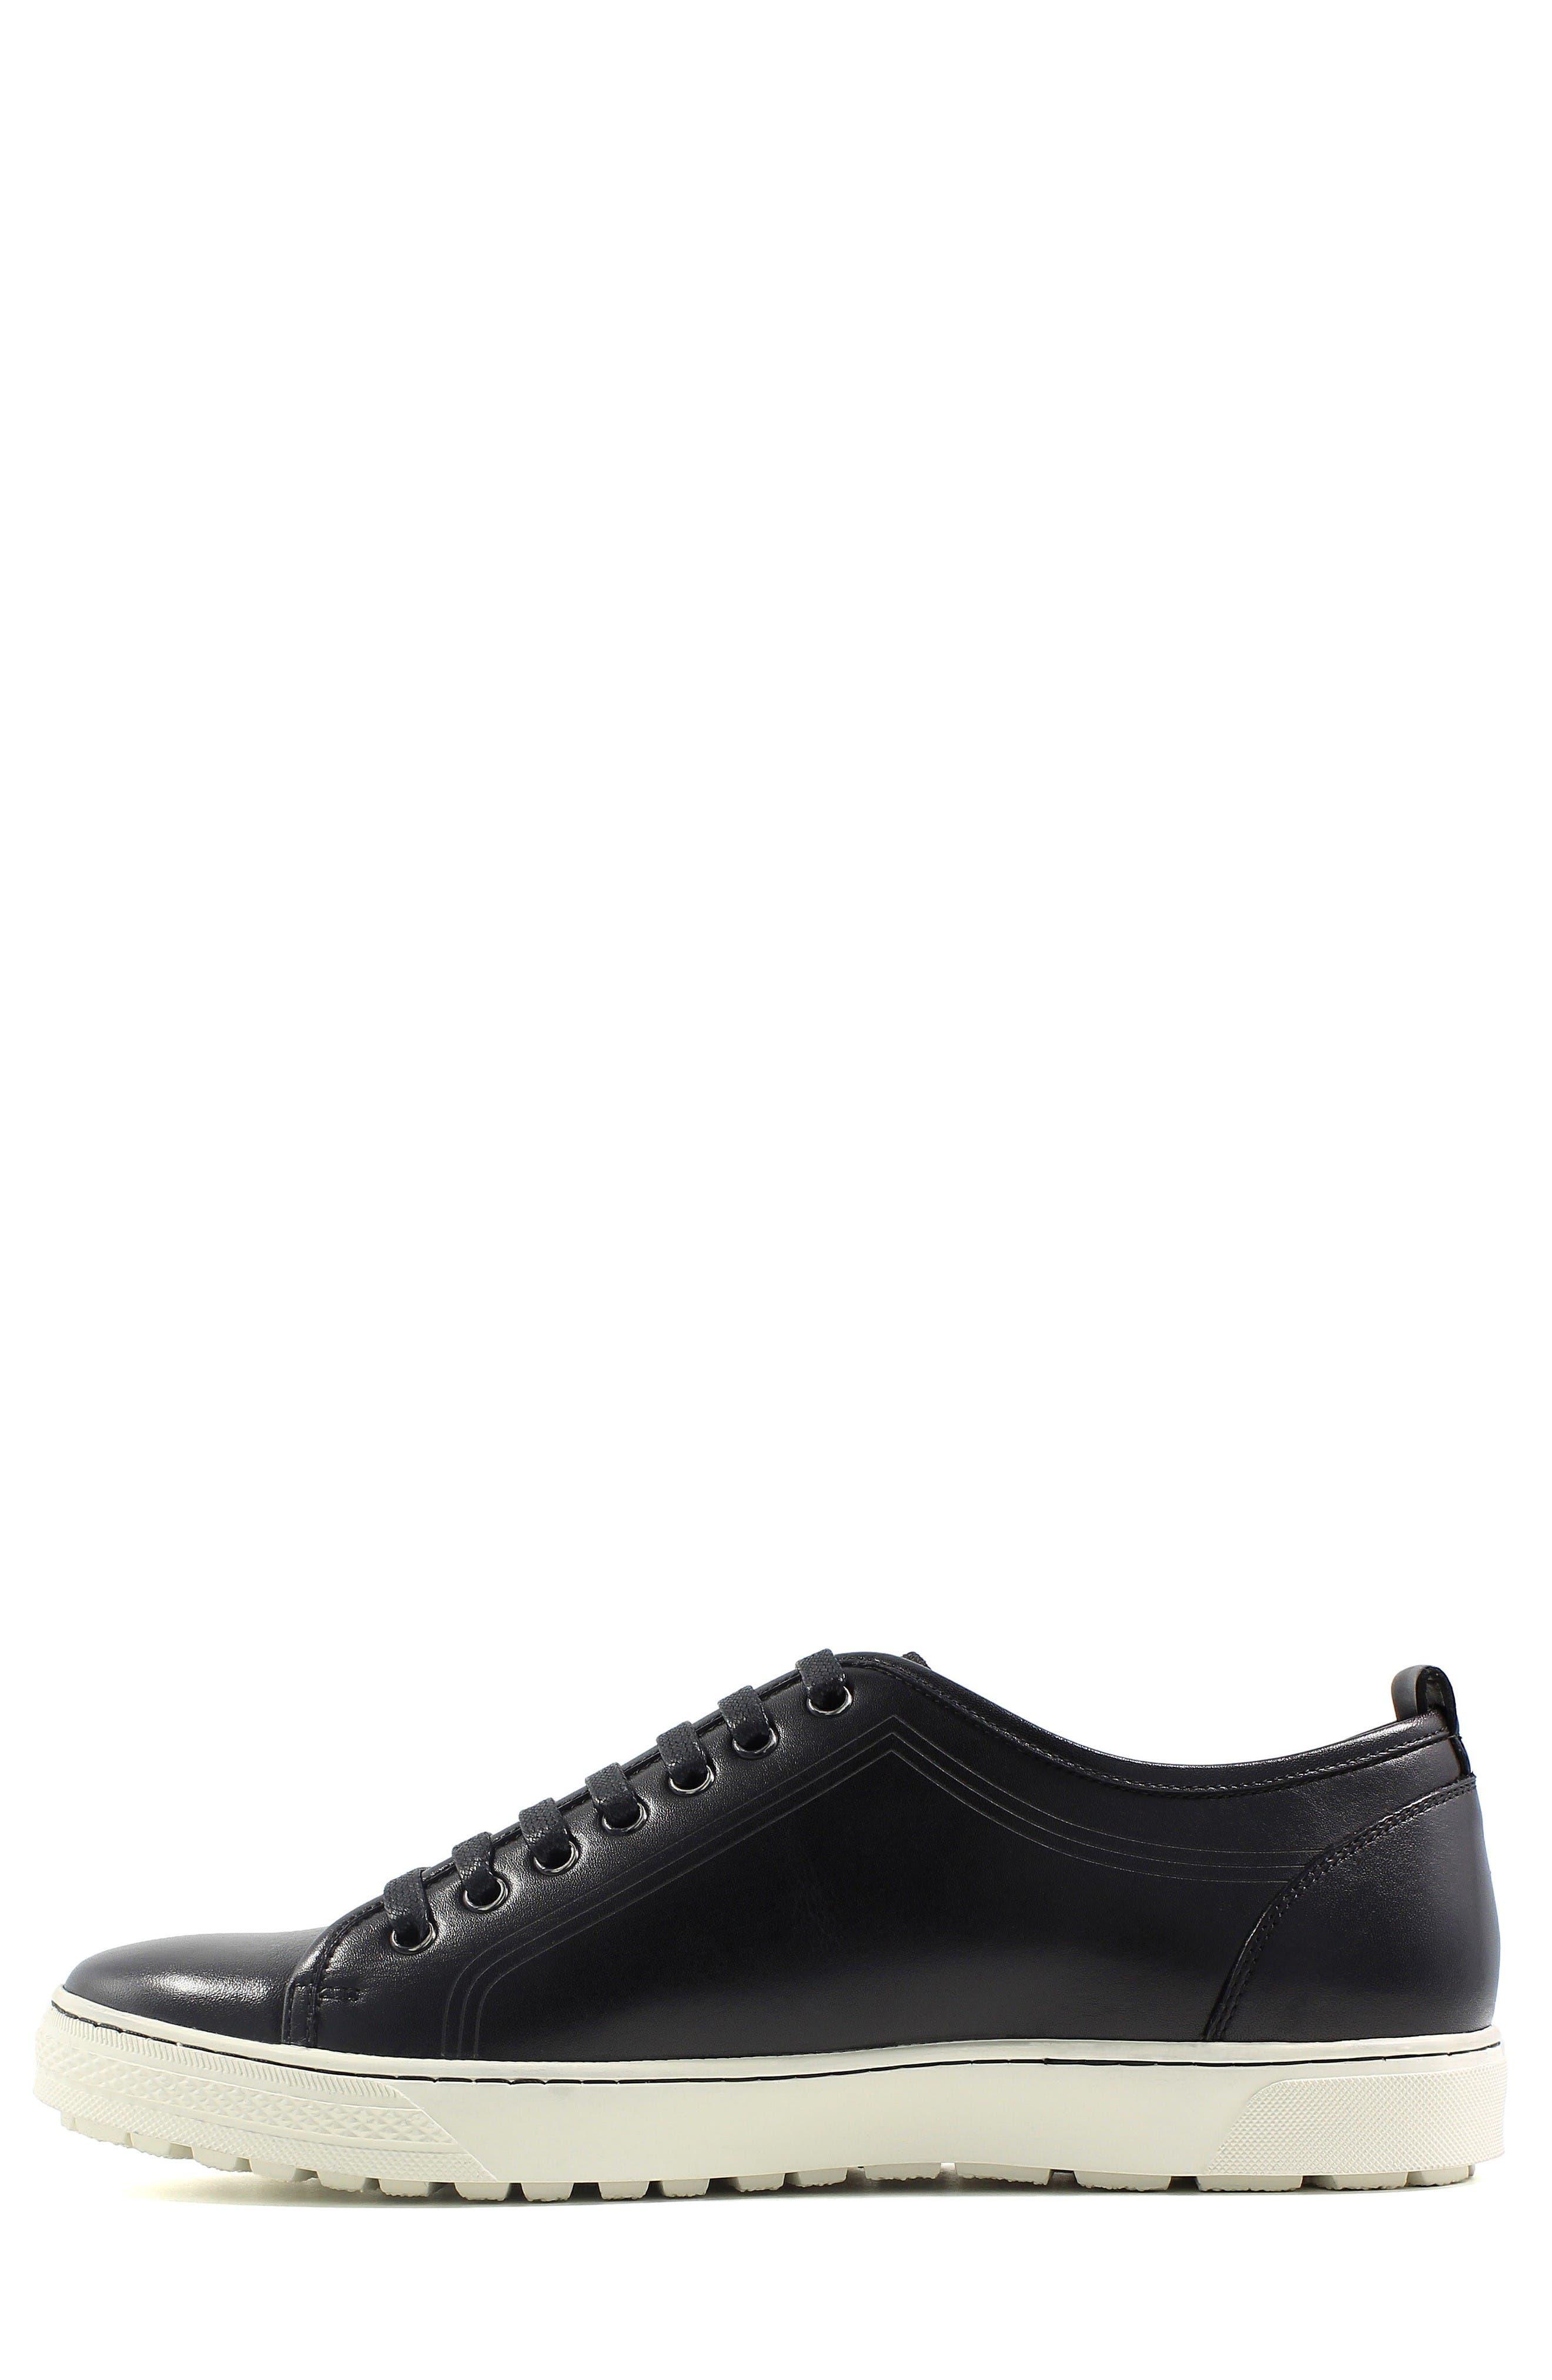 Forward Lo Sneaker,                             Alternate thumbnail 2, color,                             Black/ White Leather